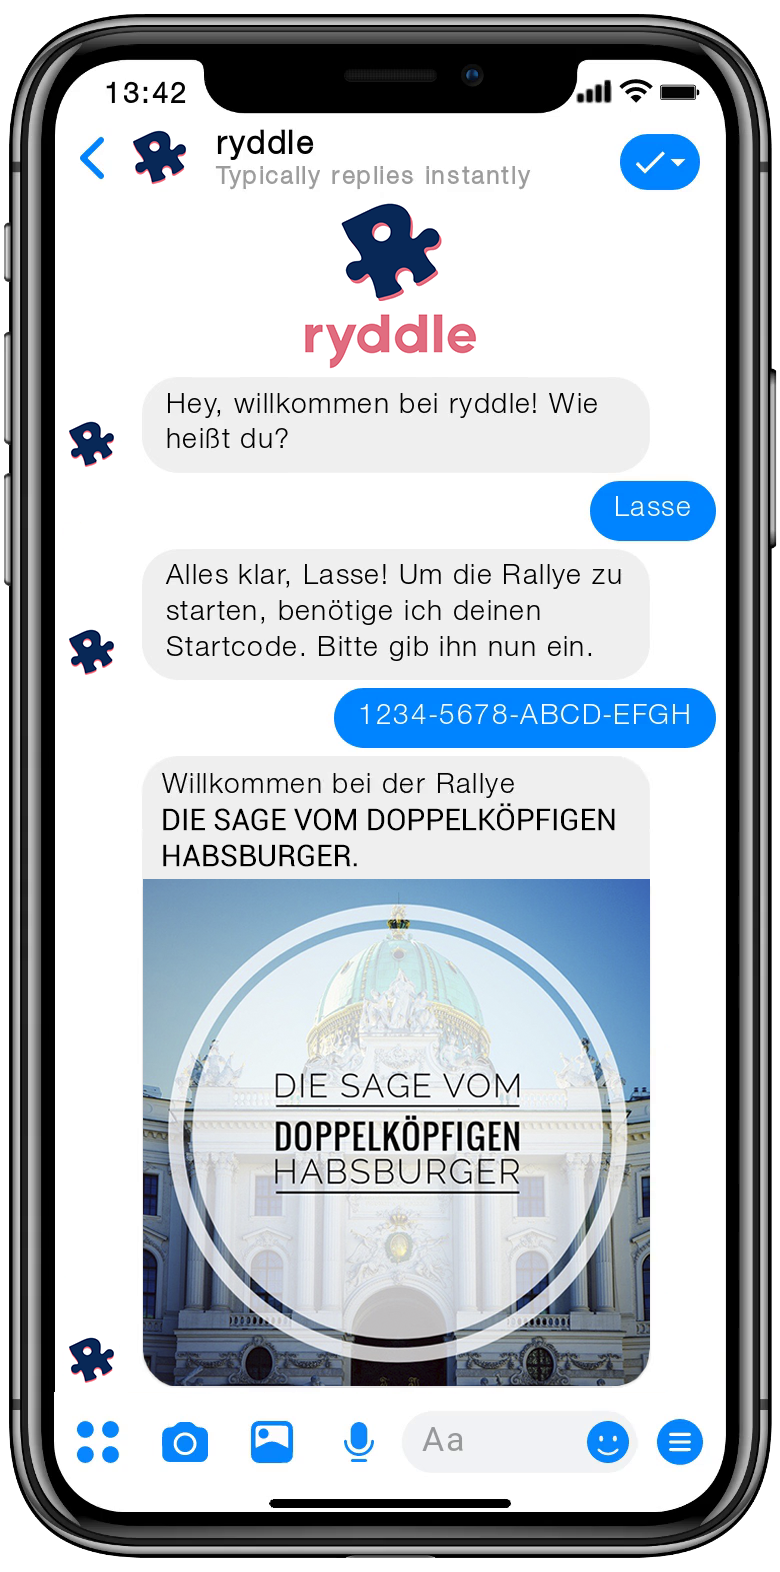 Stadtrallye Wien - Vorschau der Smartphone Schnitzeljagd